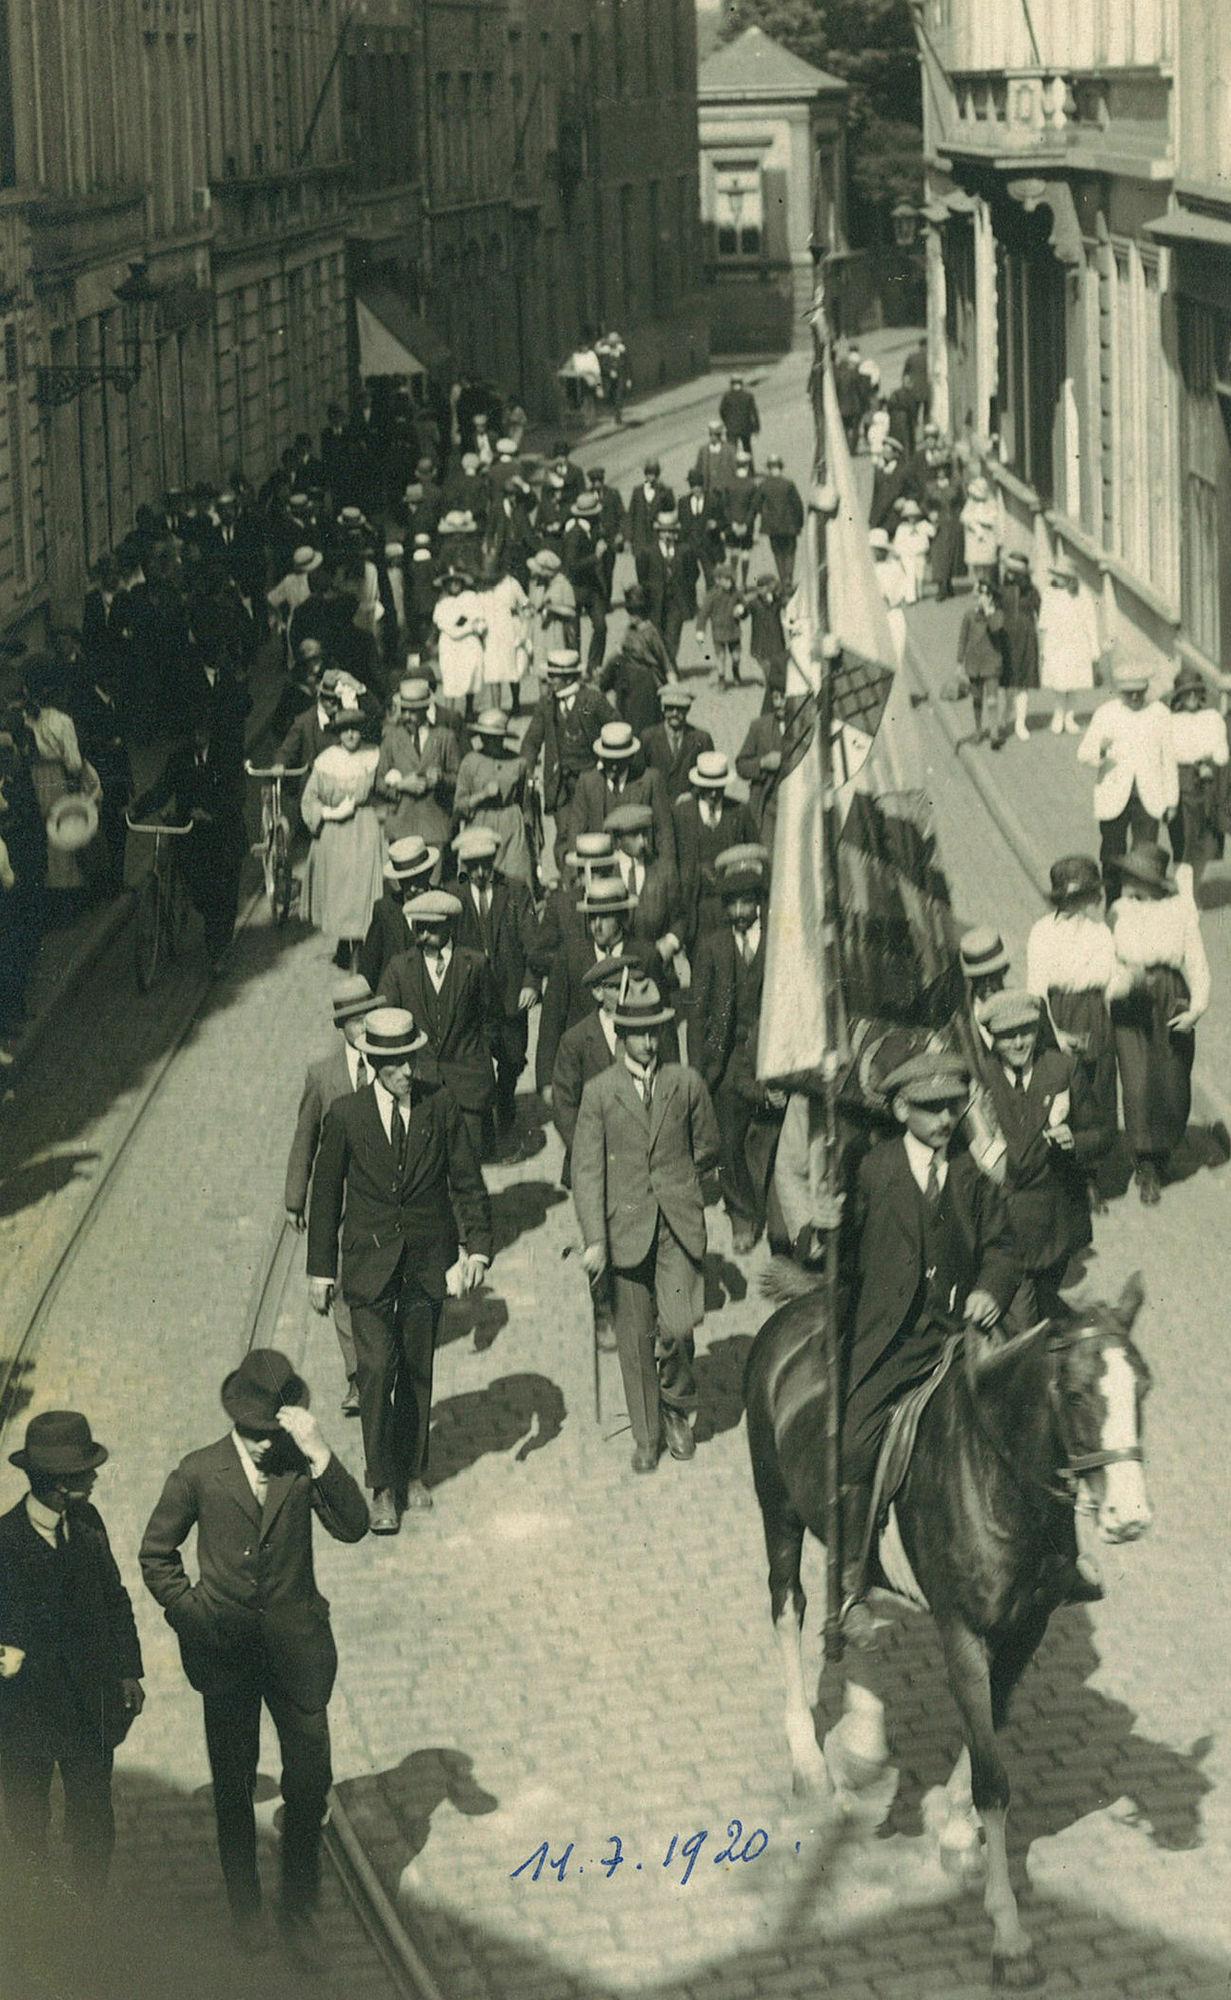 11 Julistoet, 1921